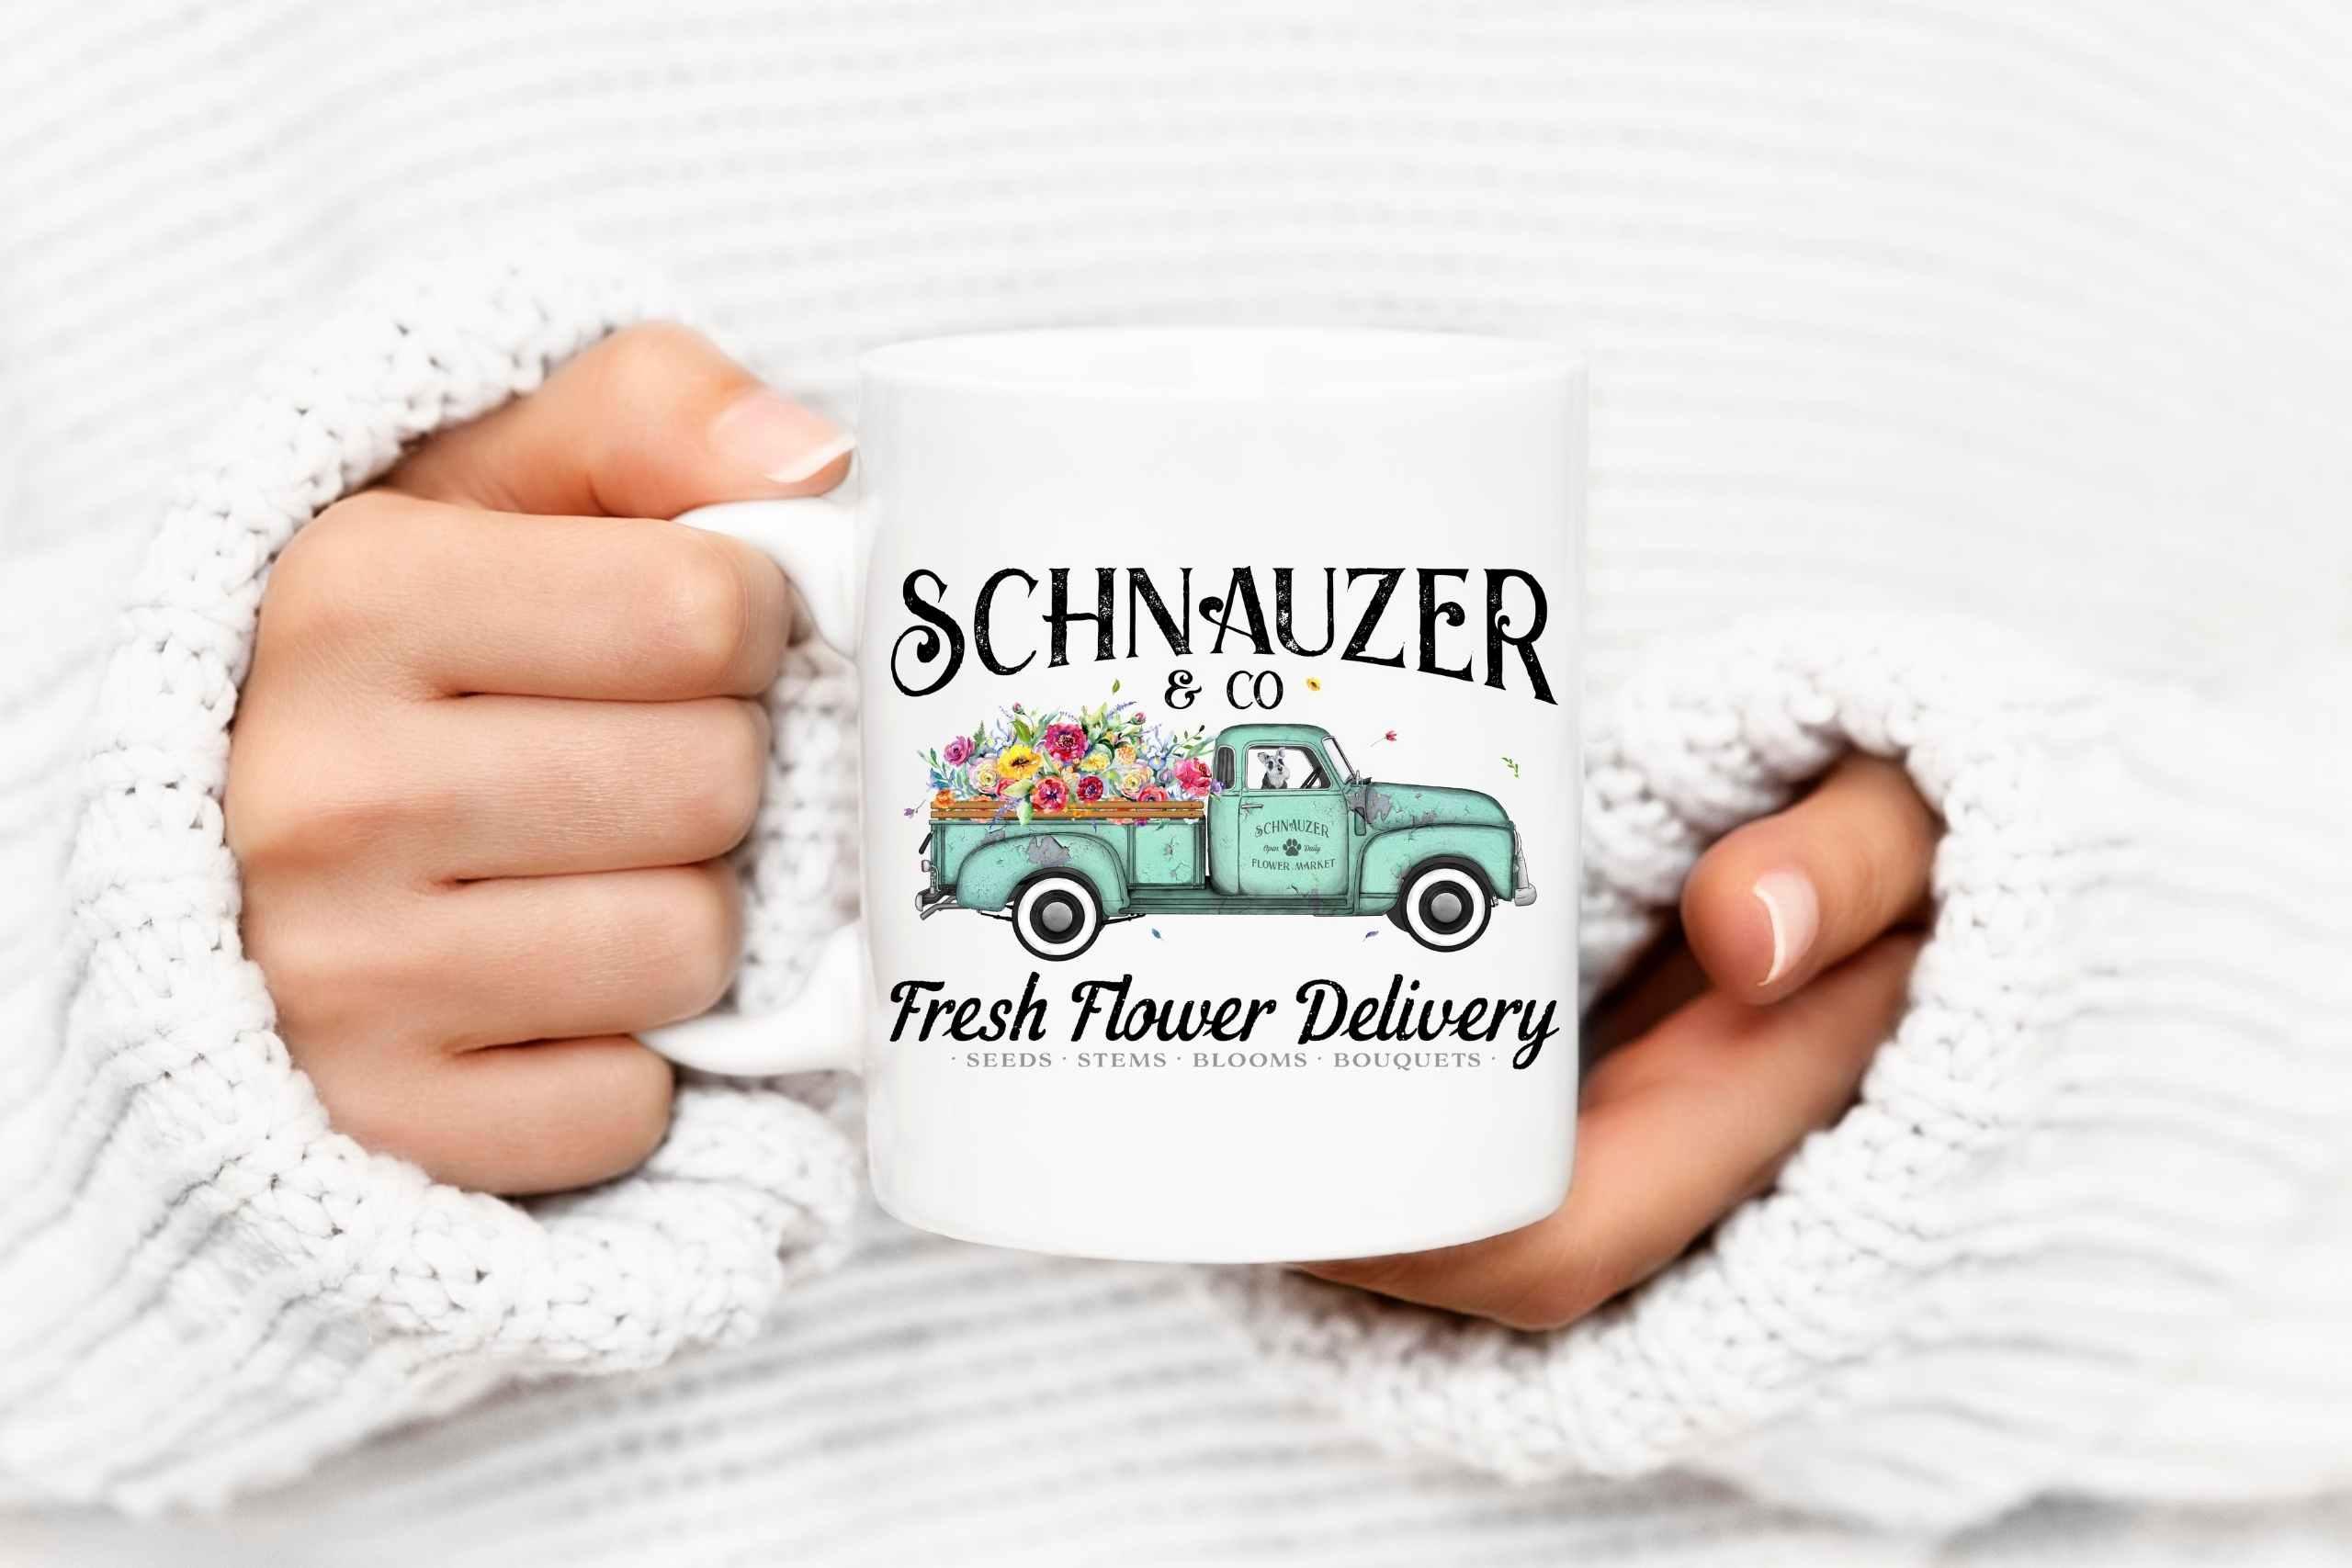 flower_deliver_schnauzer_mug